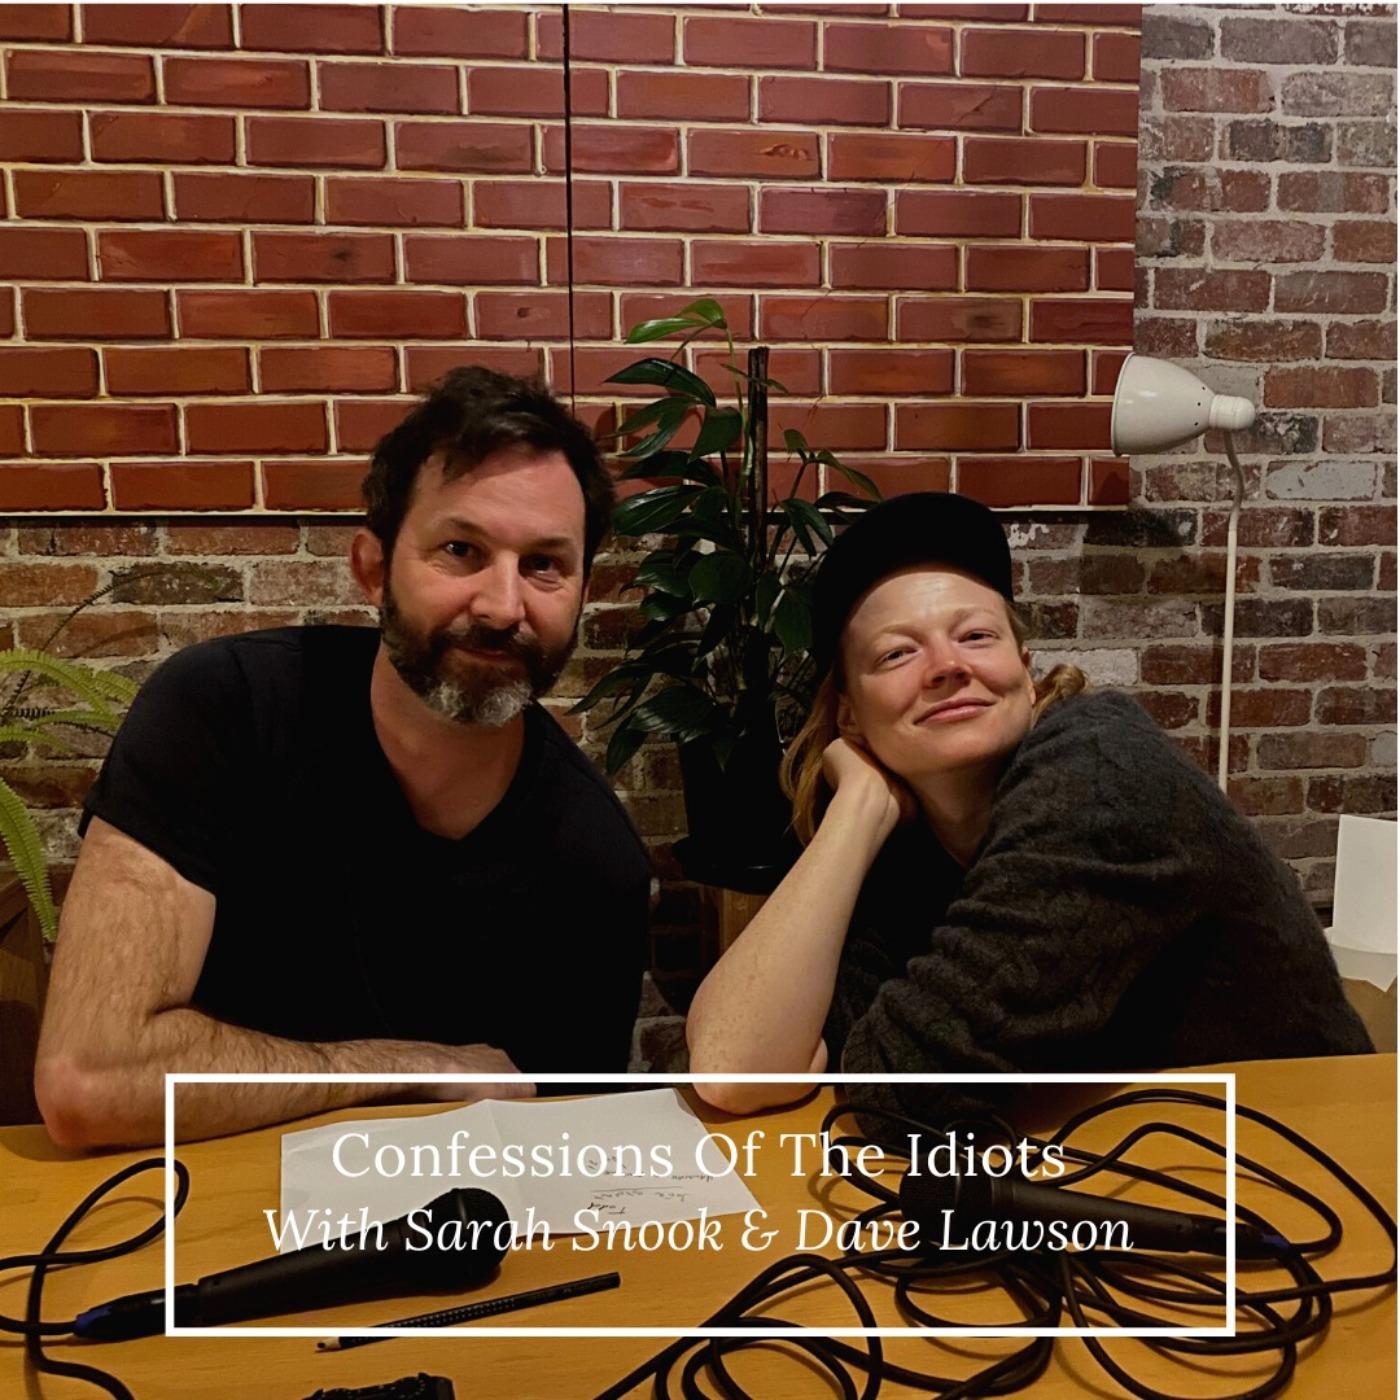 Sarah Snook and Dave Lawson